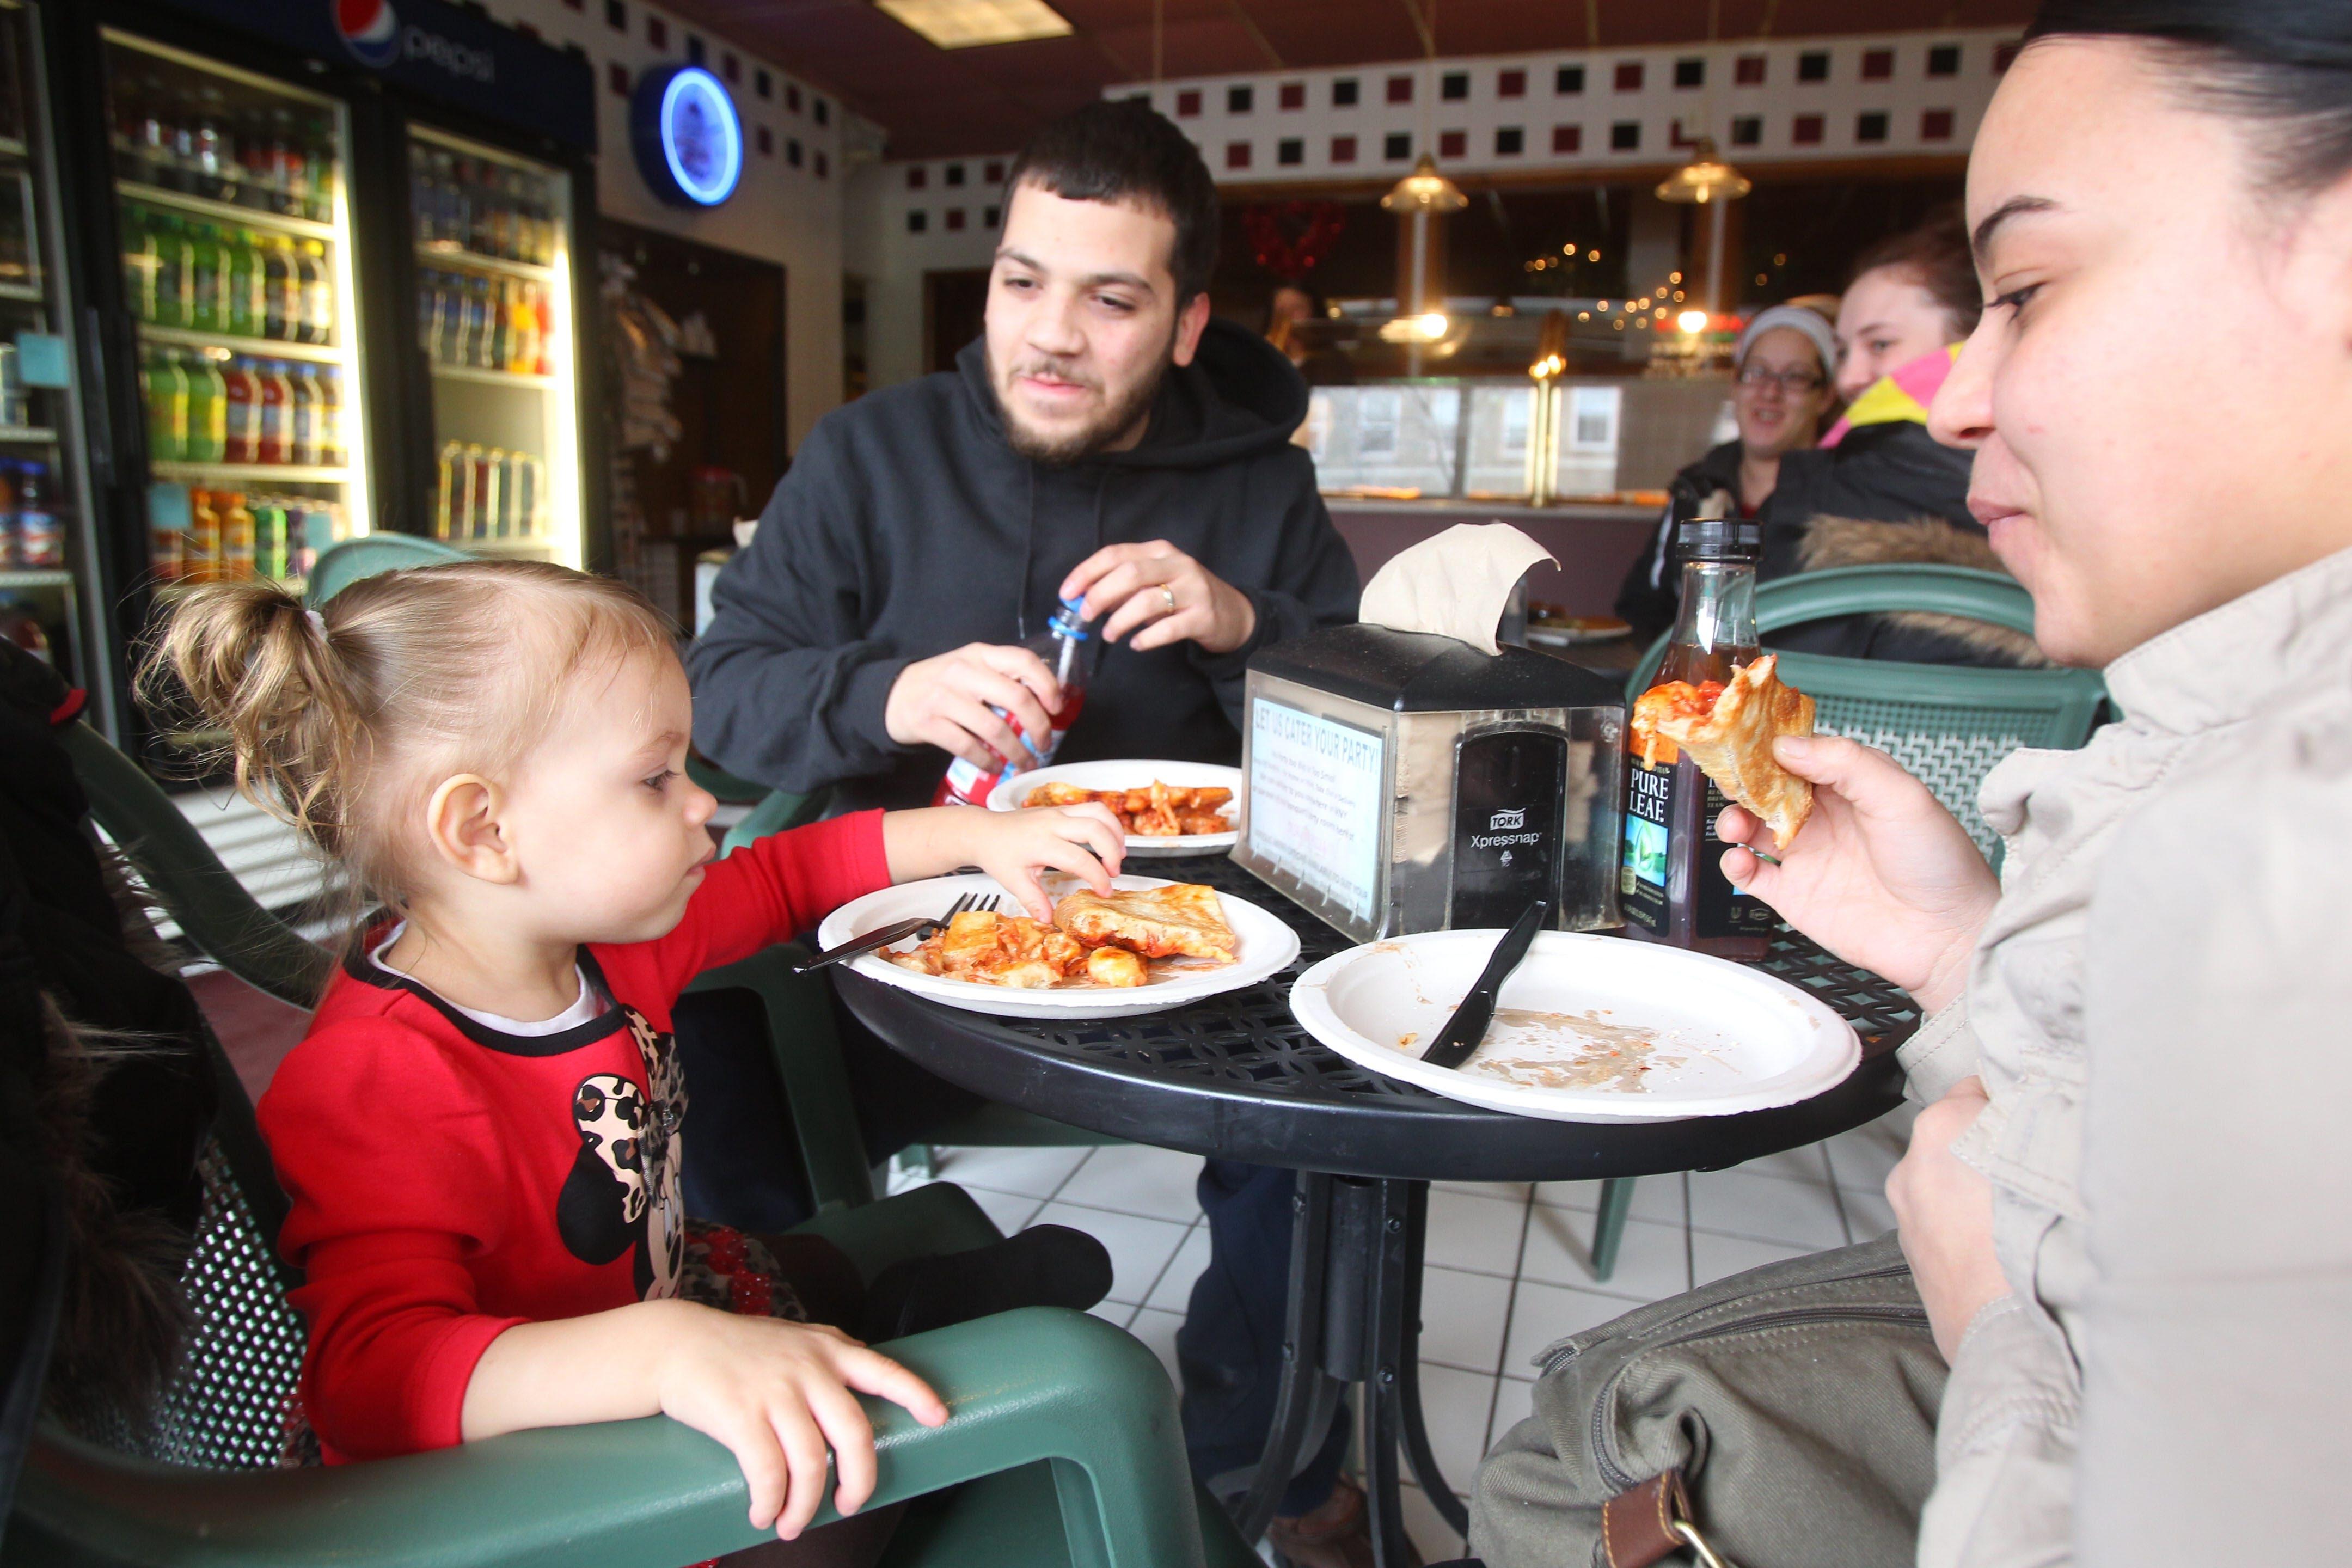 Janalyse Sanchez, left, enjoys a piece of pizza with her parents Venessa and Jorge at Casa-Di-Pizza.